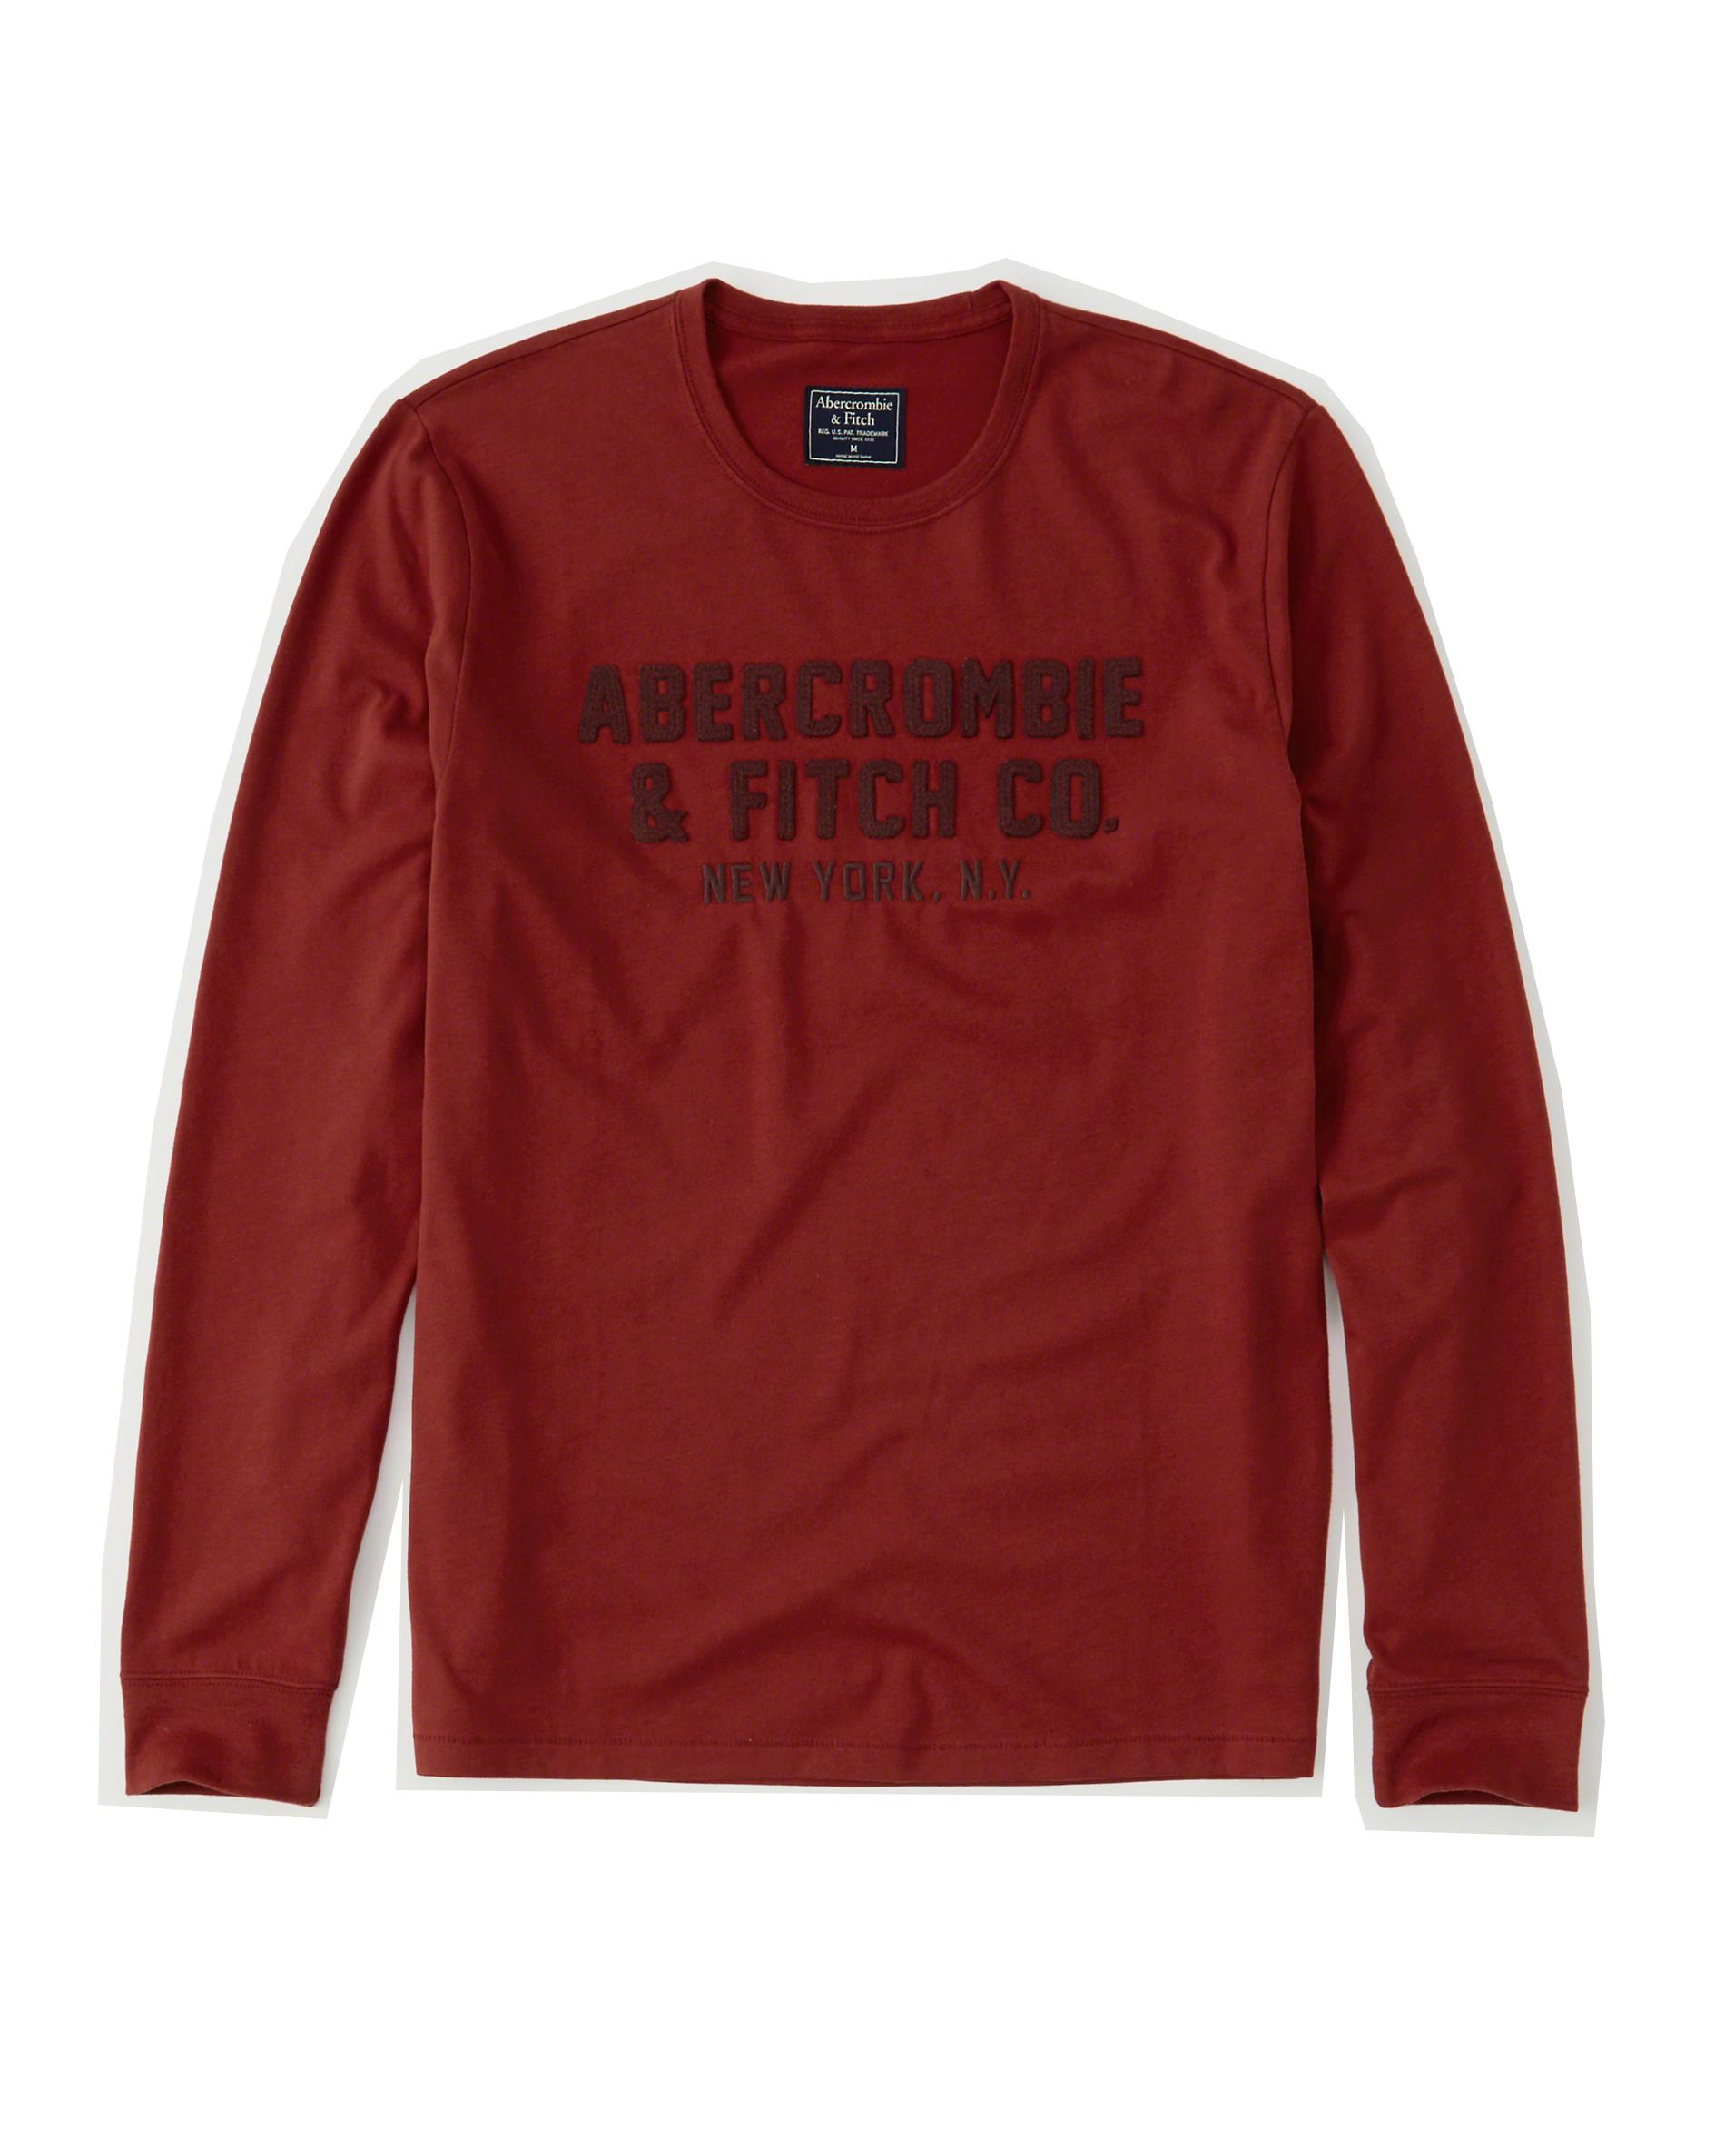 Abercrombie LONG SLEEVE S bluza koszulka